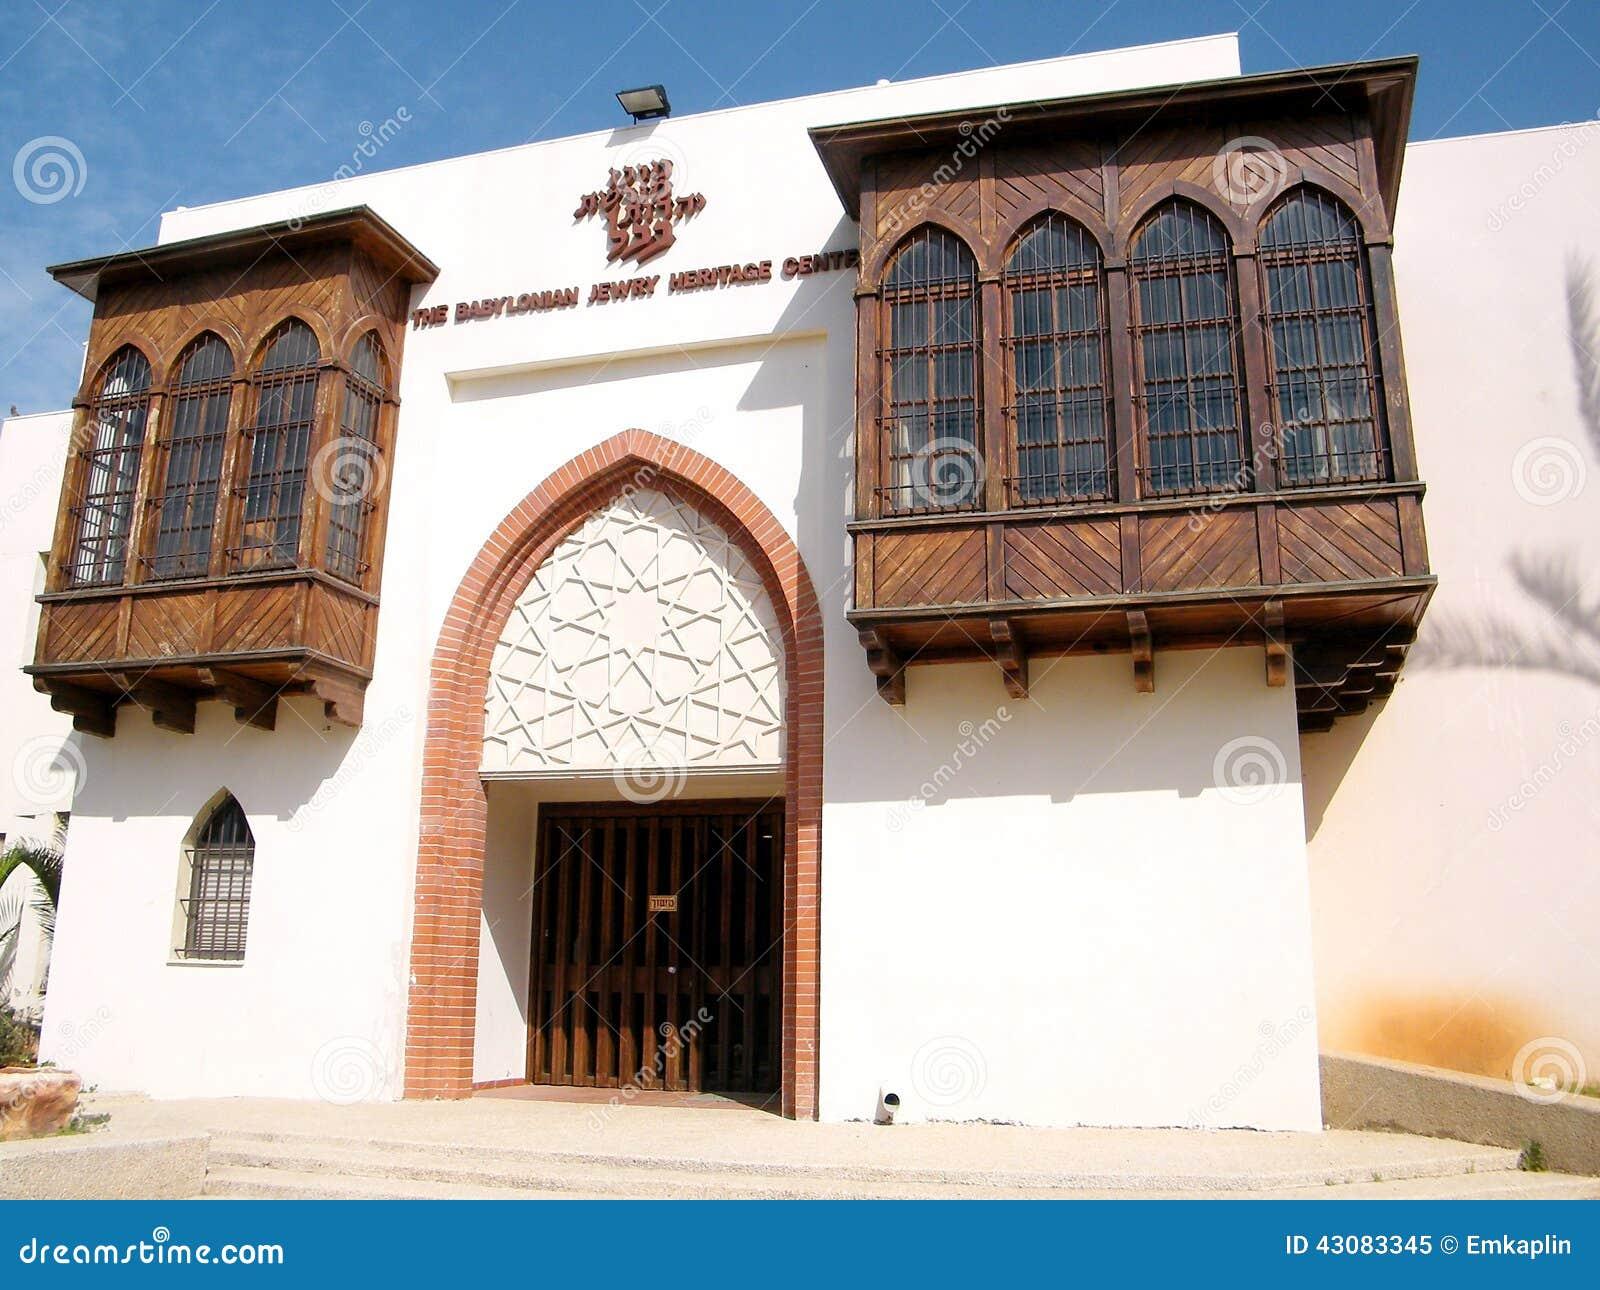 Of Yehuda Babylonian Jewry Museum 2011